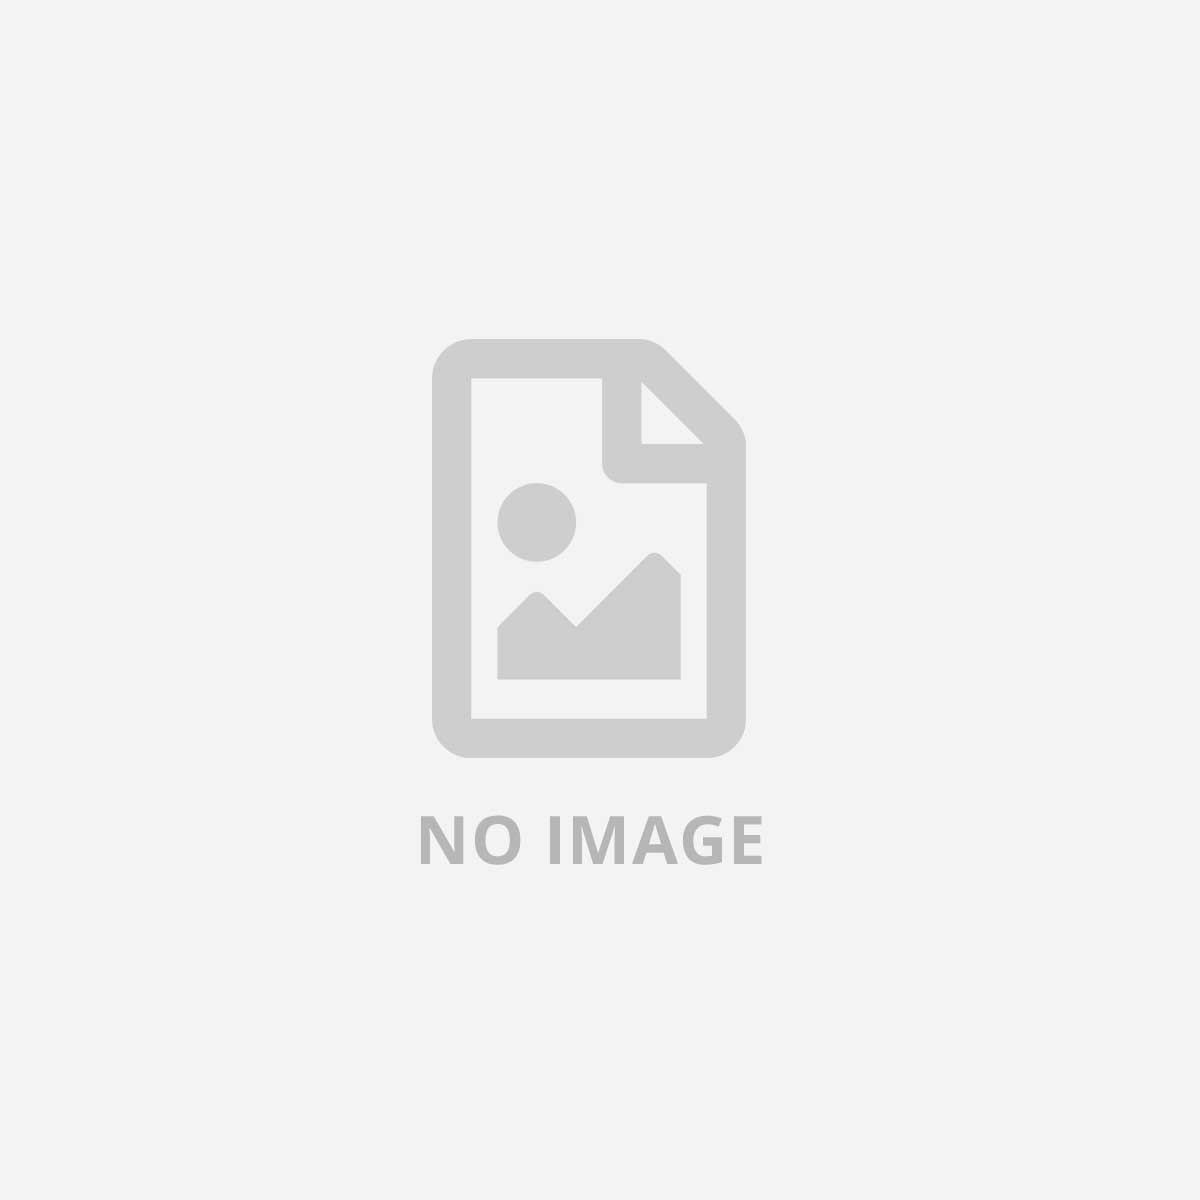 WATCHGUARD POWER ADAPTER AP100/AP102/AP200